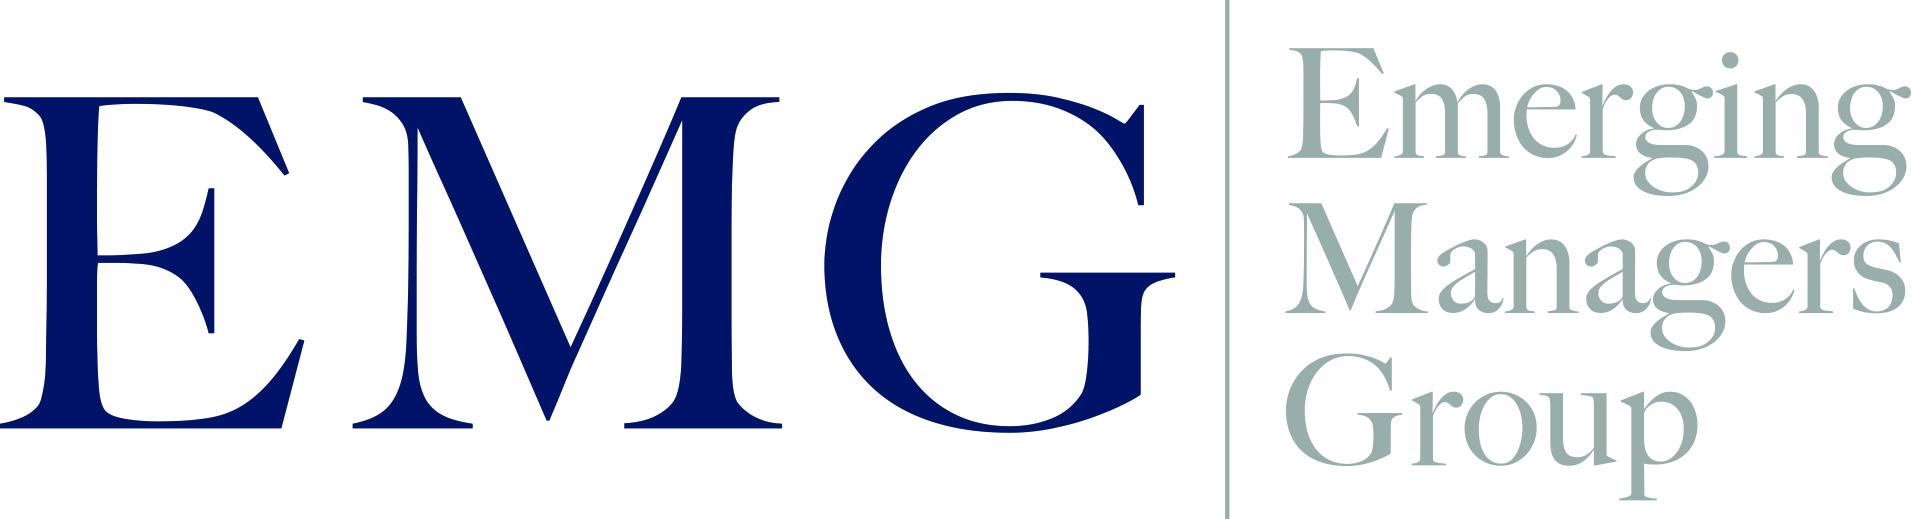 EMG Logo Updated High Res 300dpi CMYK.jpg